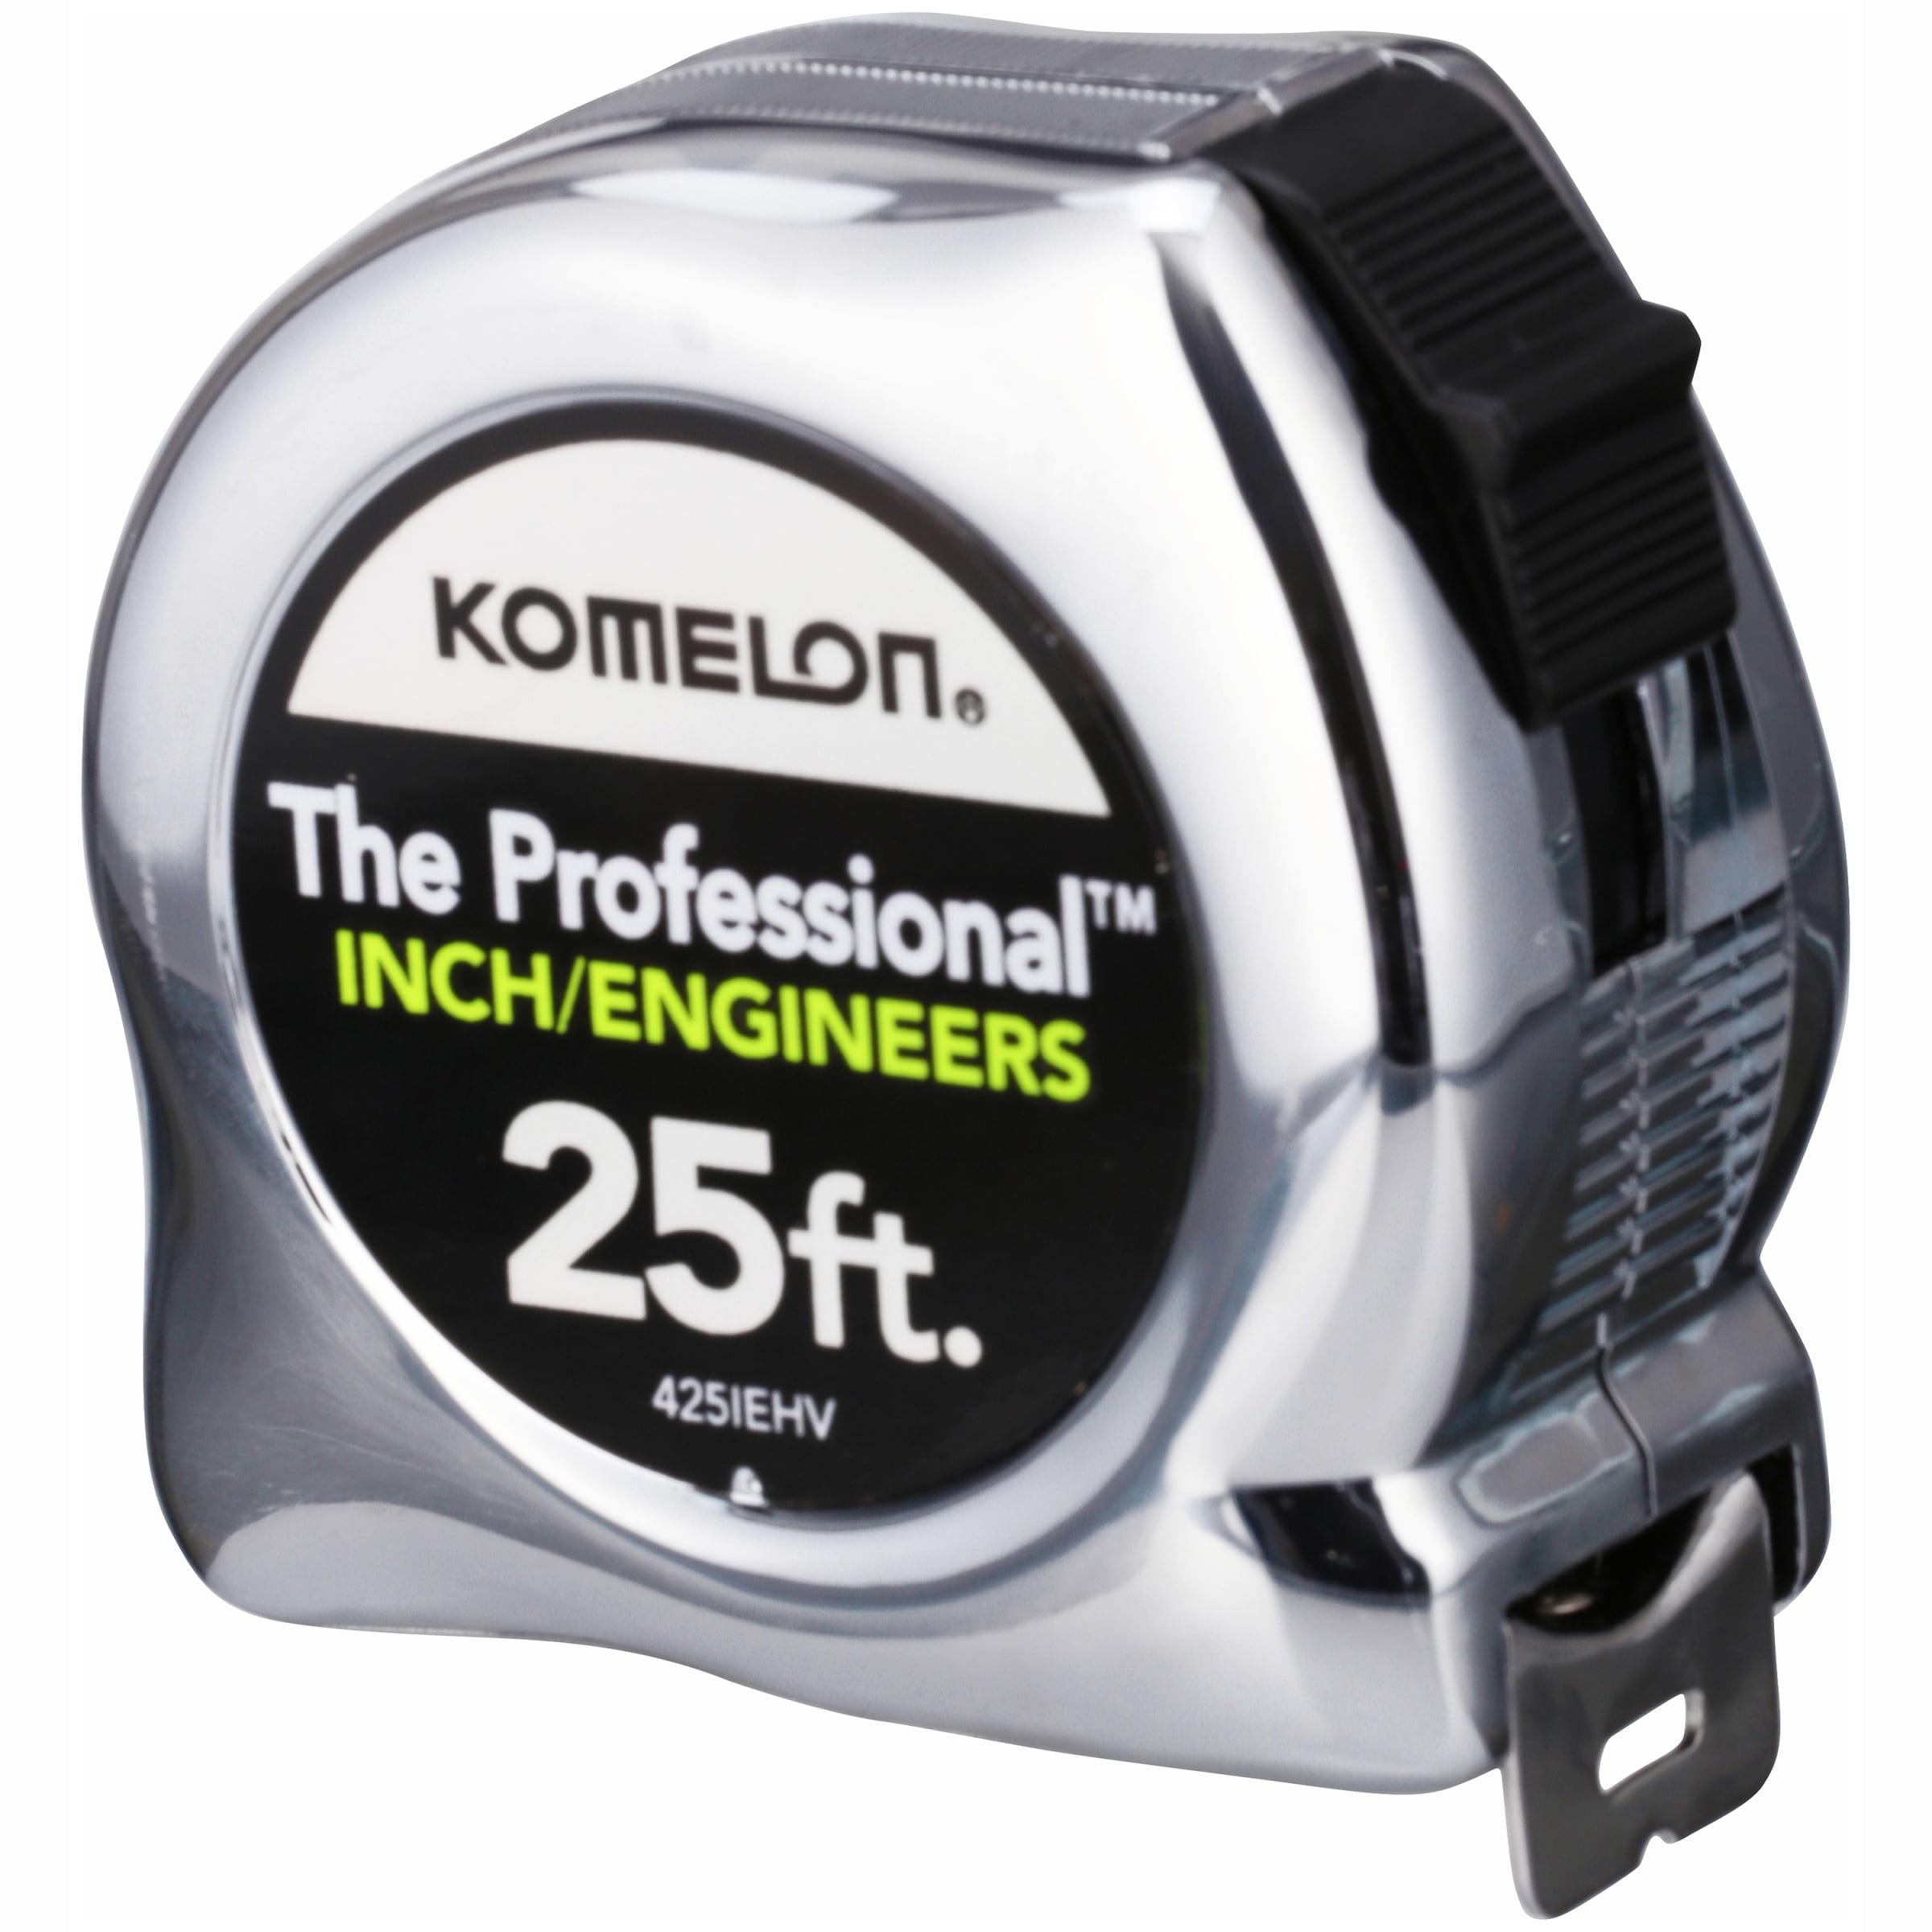 Komelon The Professional Premium 25 ft. Tape Measure by Komelon USA Division